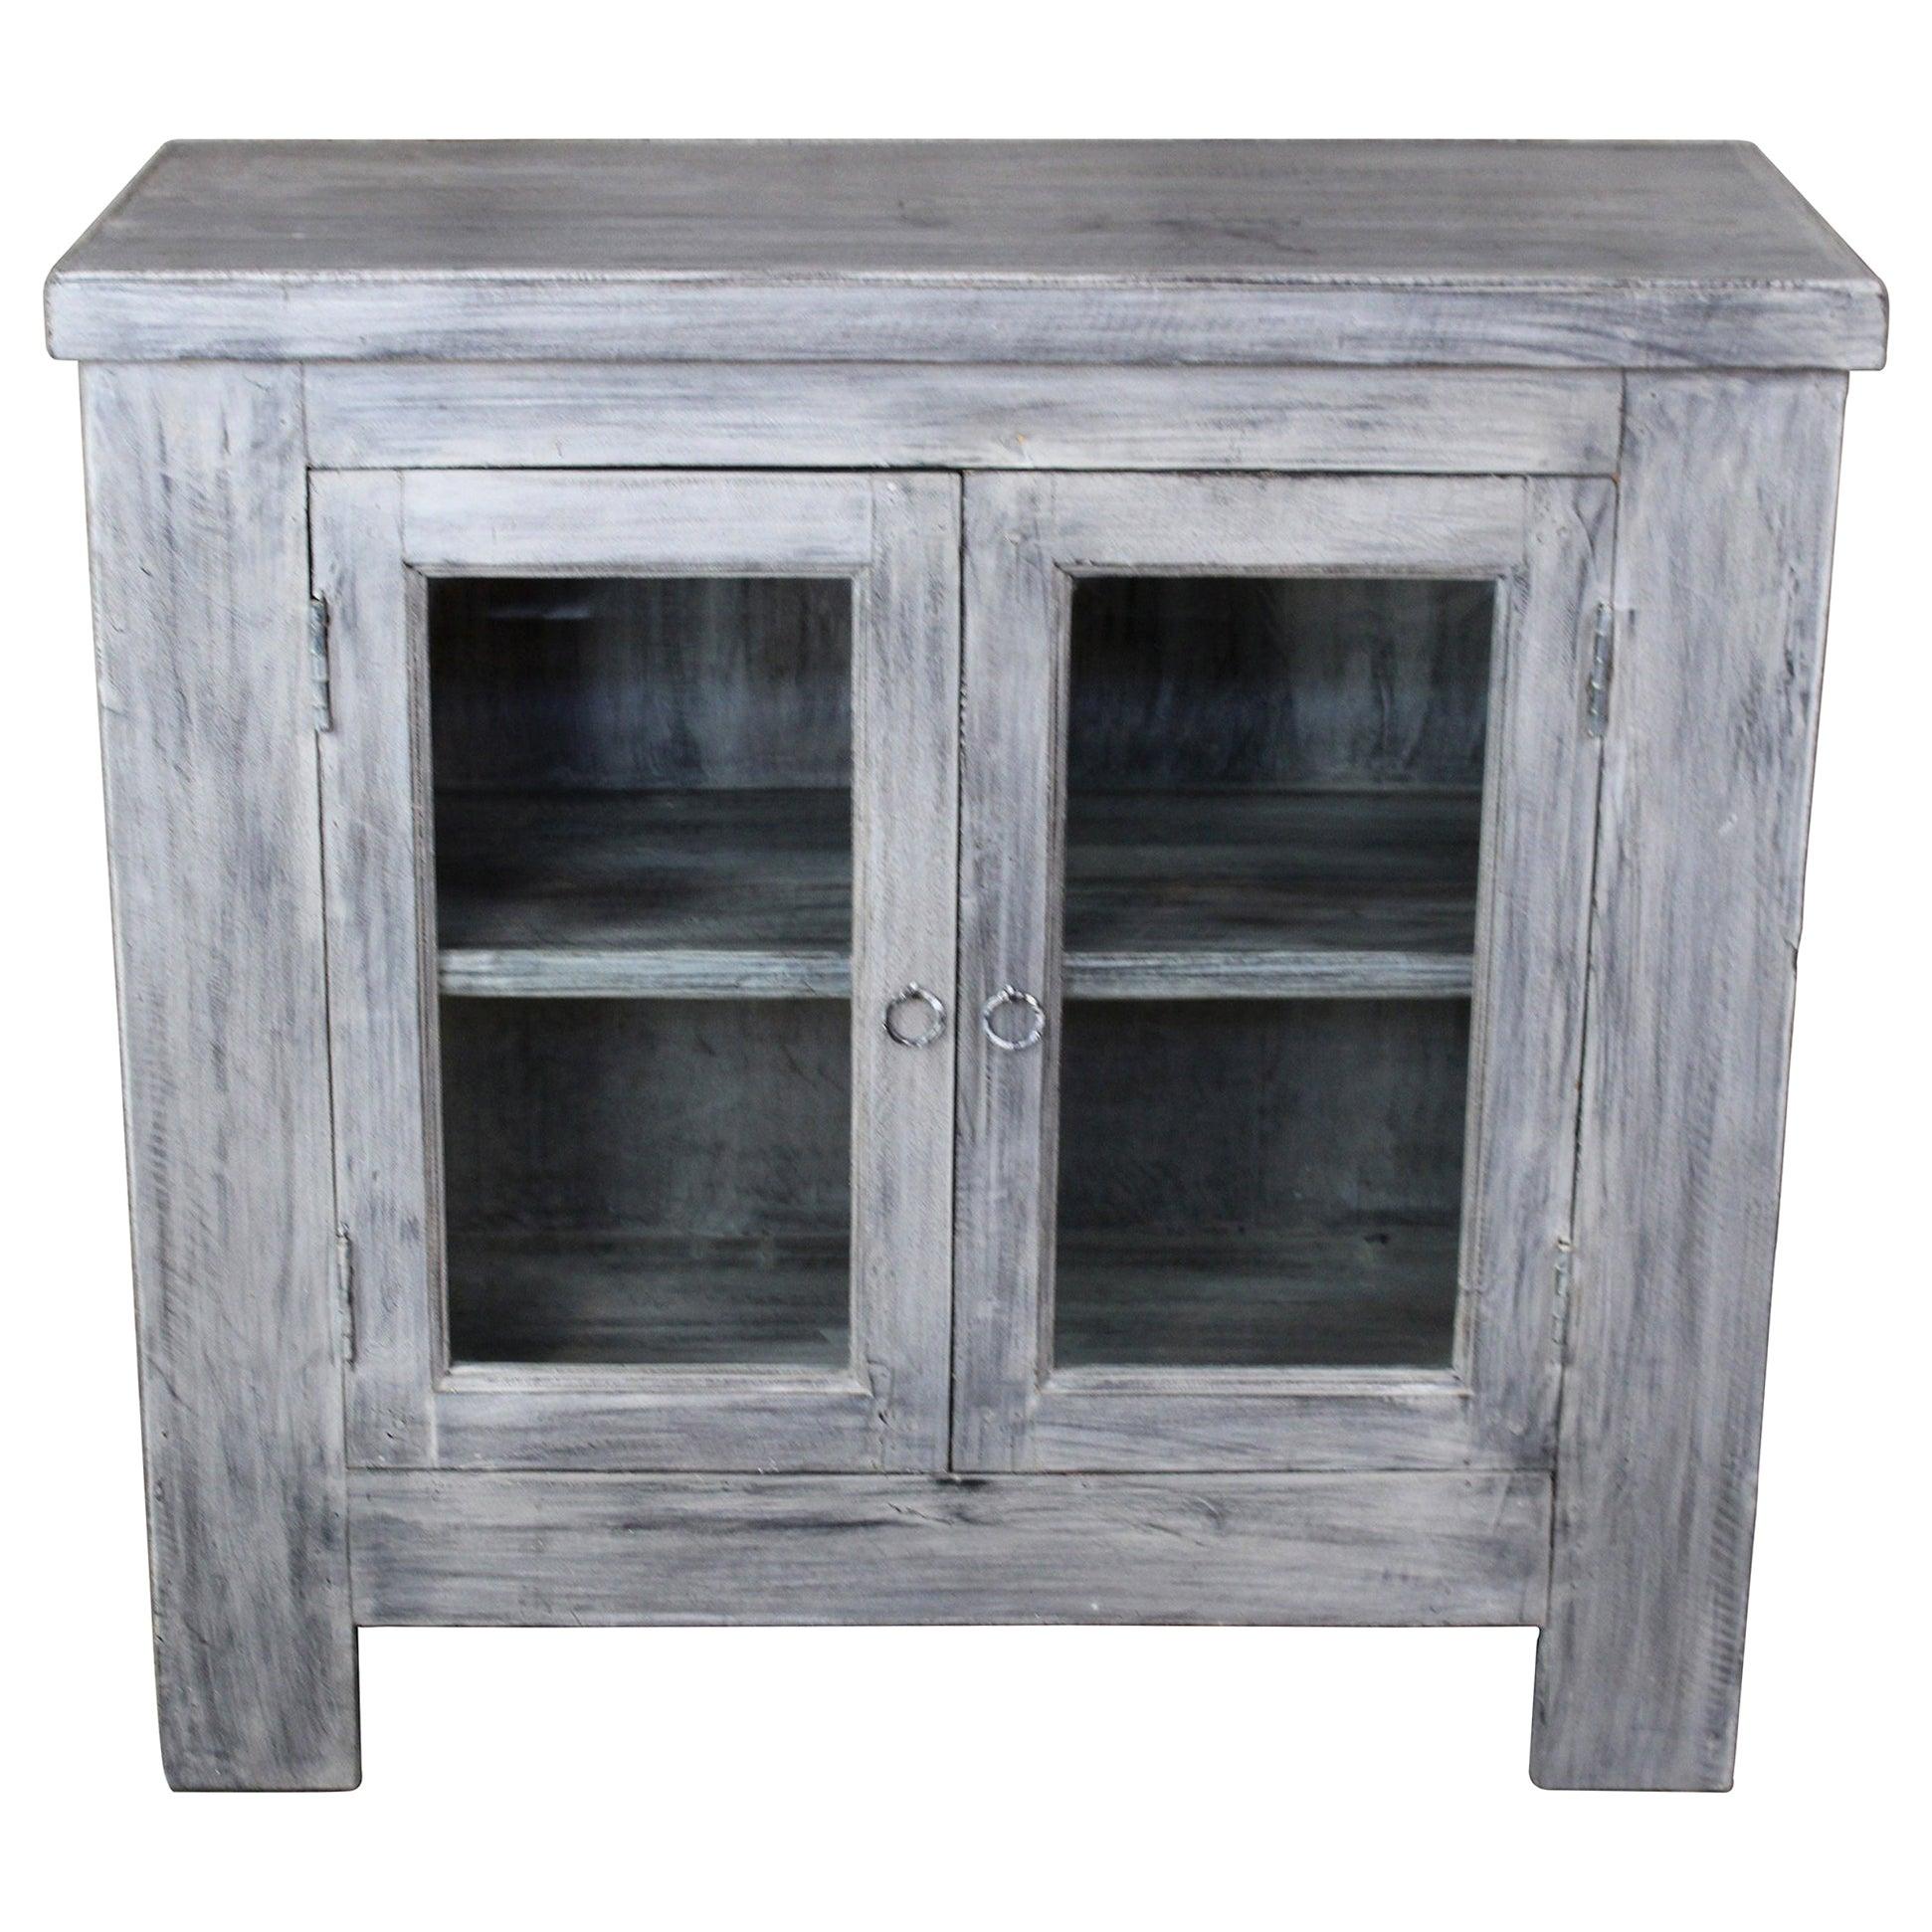 Vintage Arhaus Furniture Modern Grey 2-Door Glass TV Media Cabinet Console